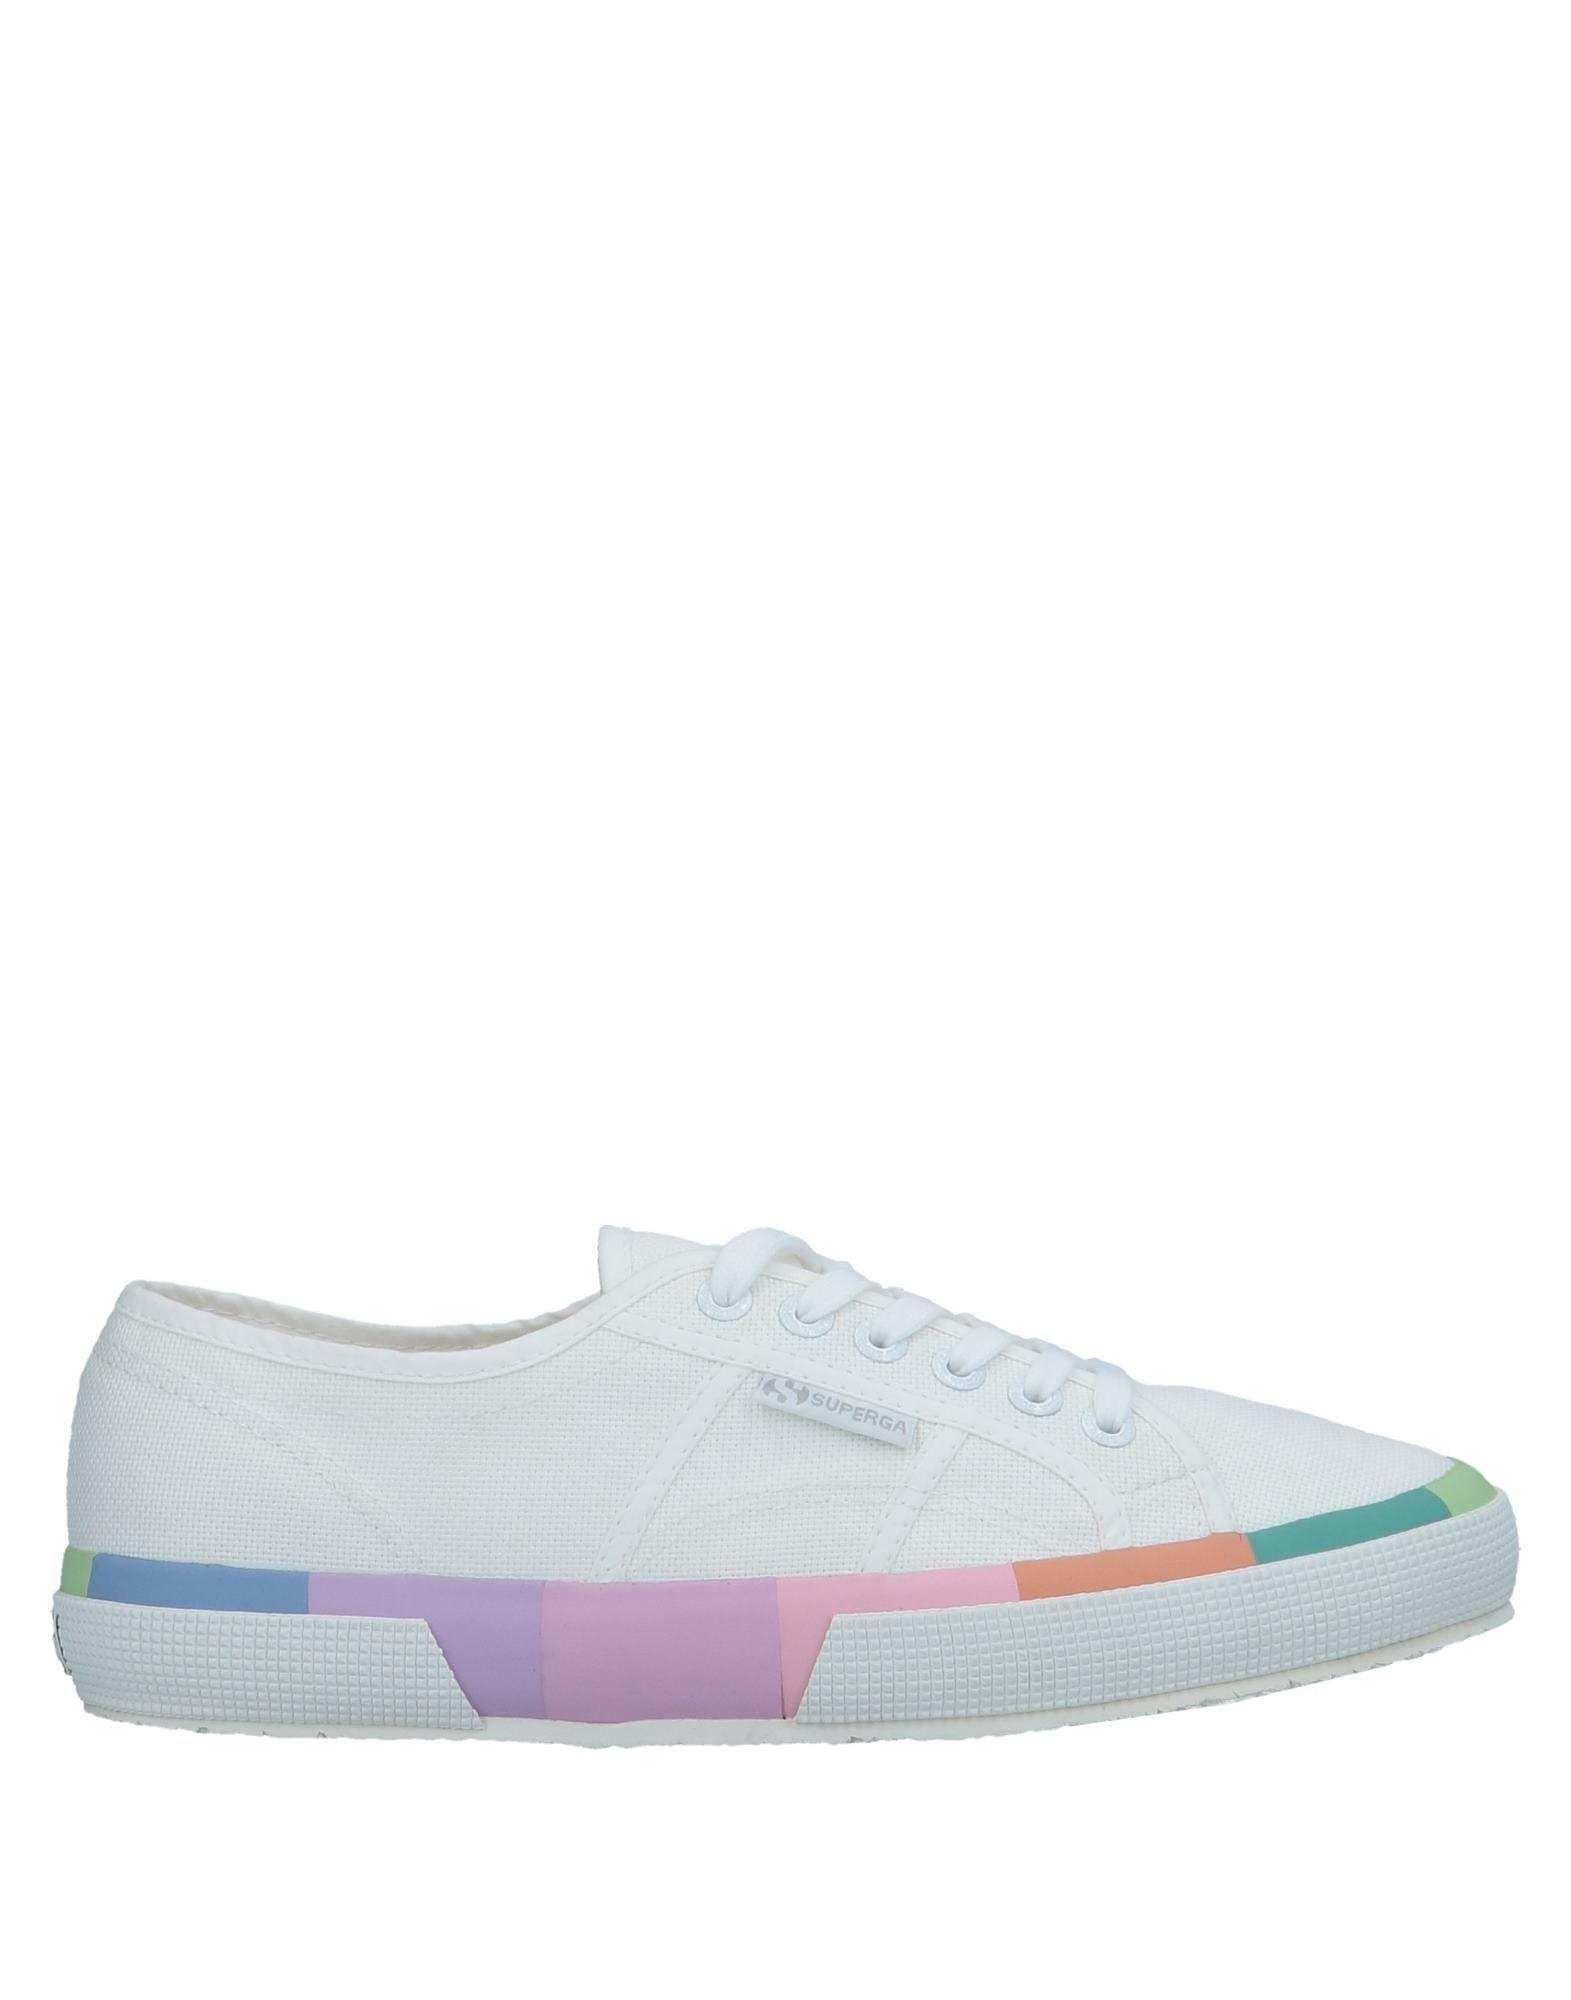 Superga® Sneakers - Women  Superga® Sneakers online on  Women Australia - 11570895EM a6ccb6